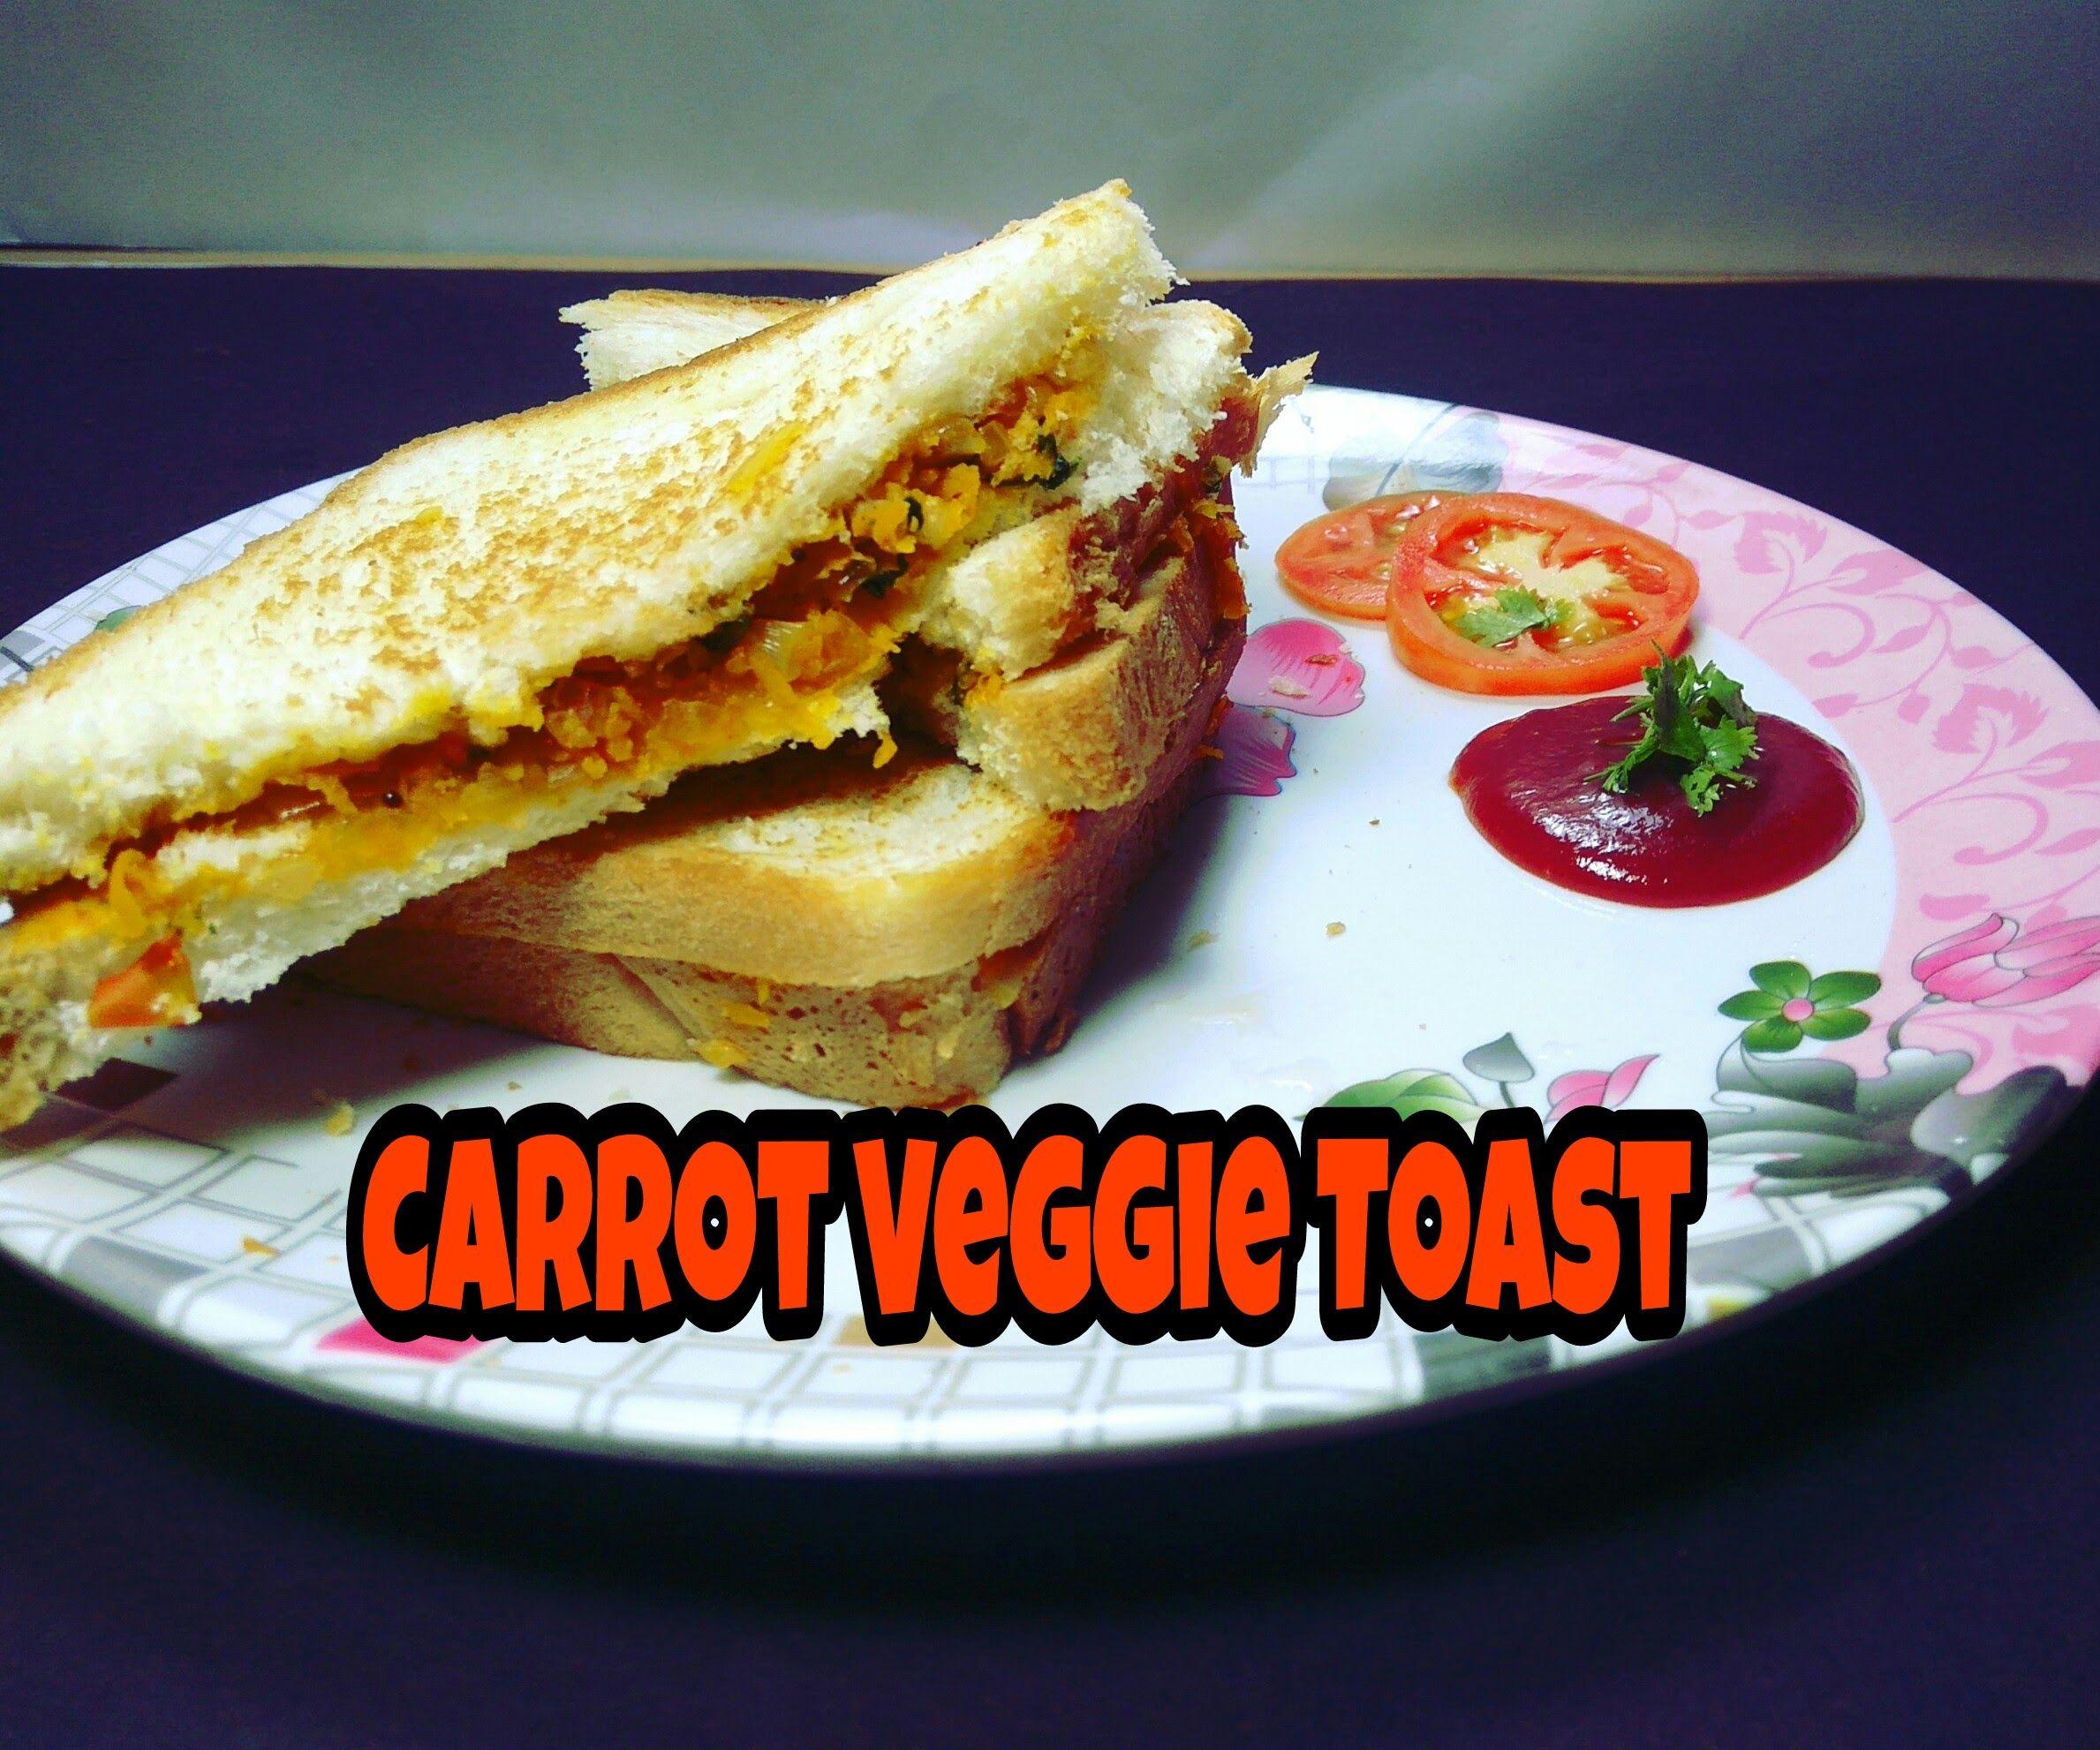 Carrot Veggie Toasted Sandwich